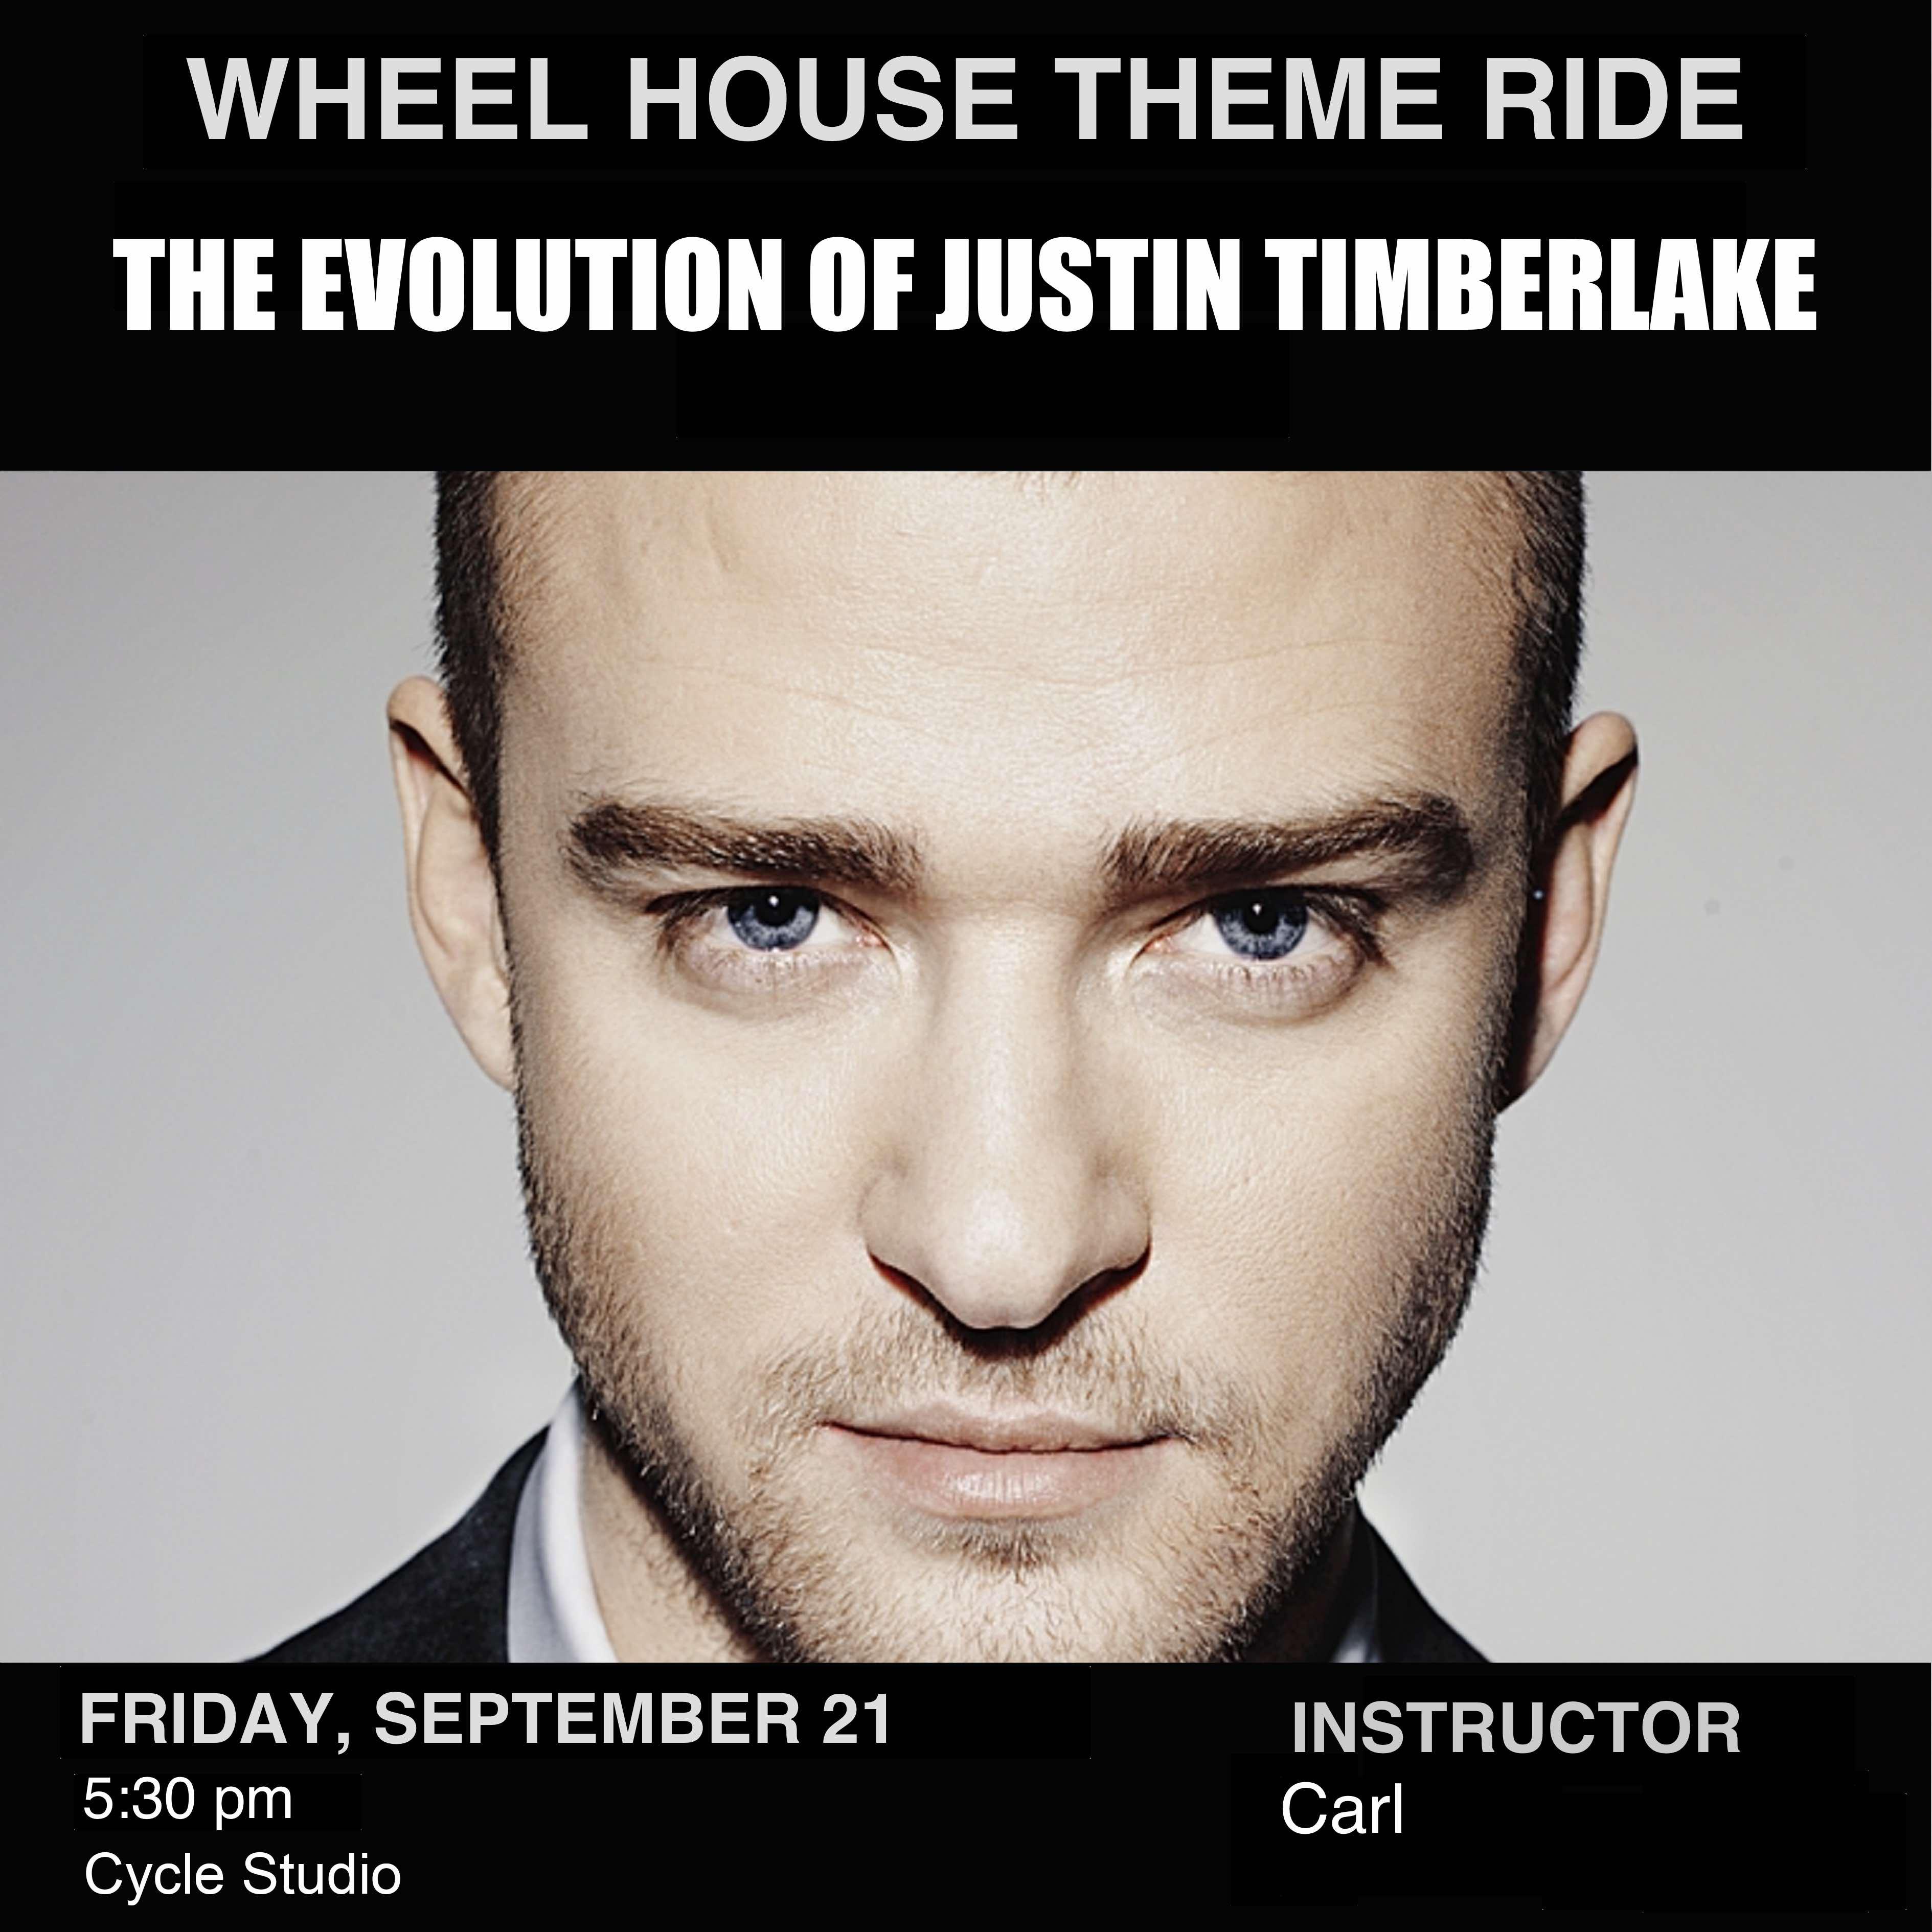 The Evolution of Justin Timberlake